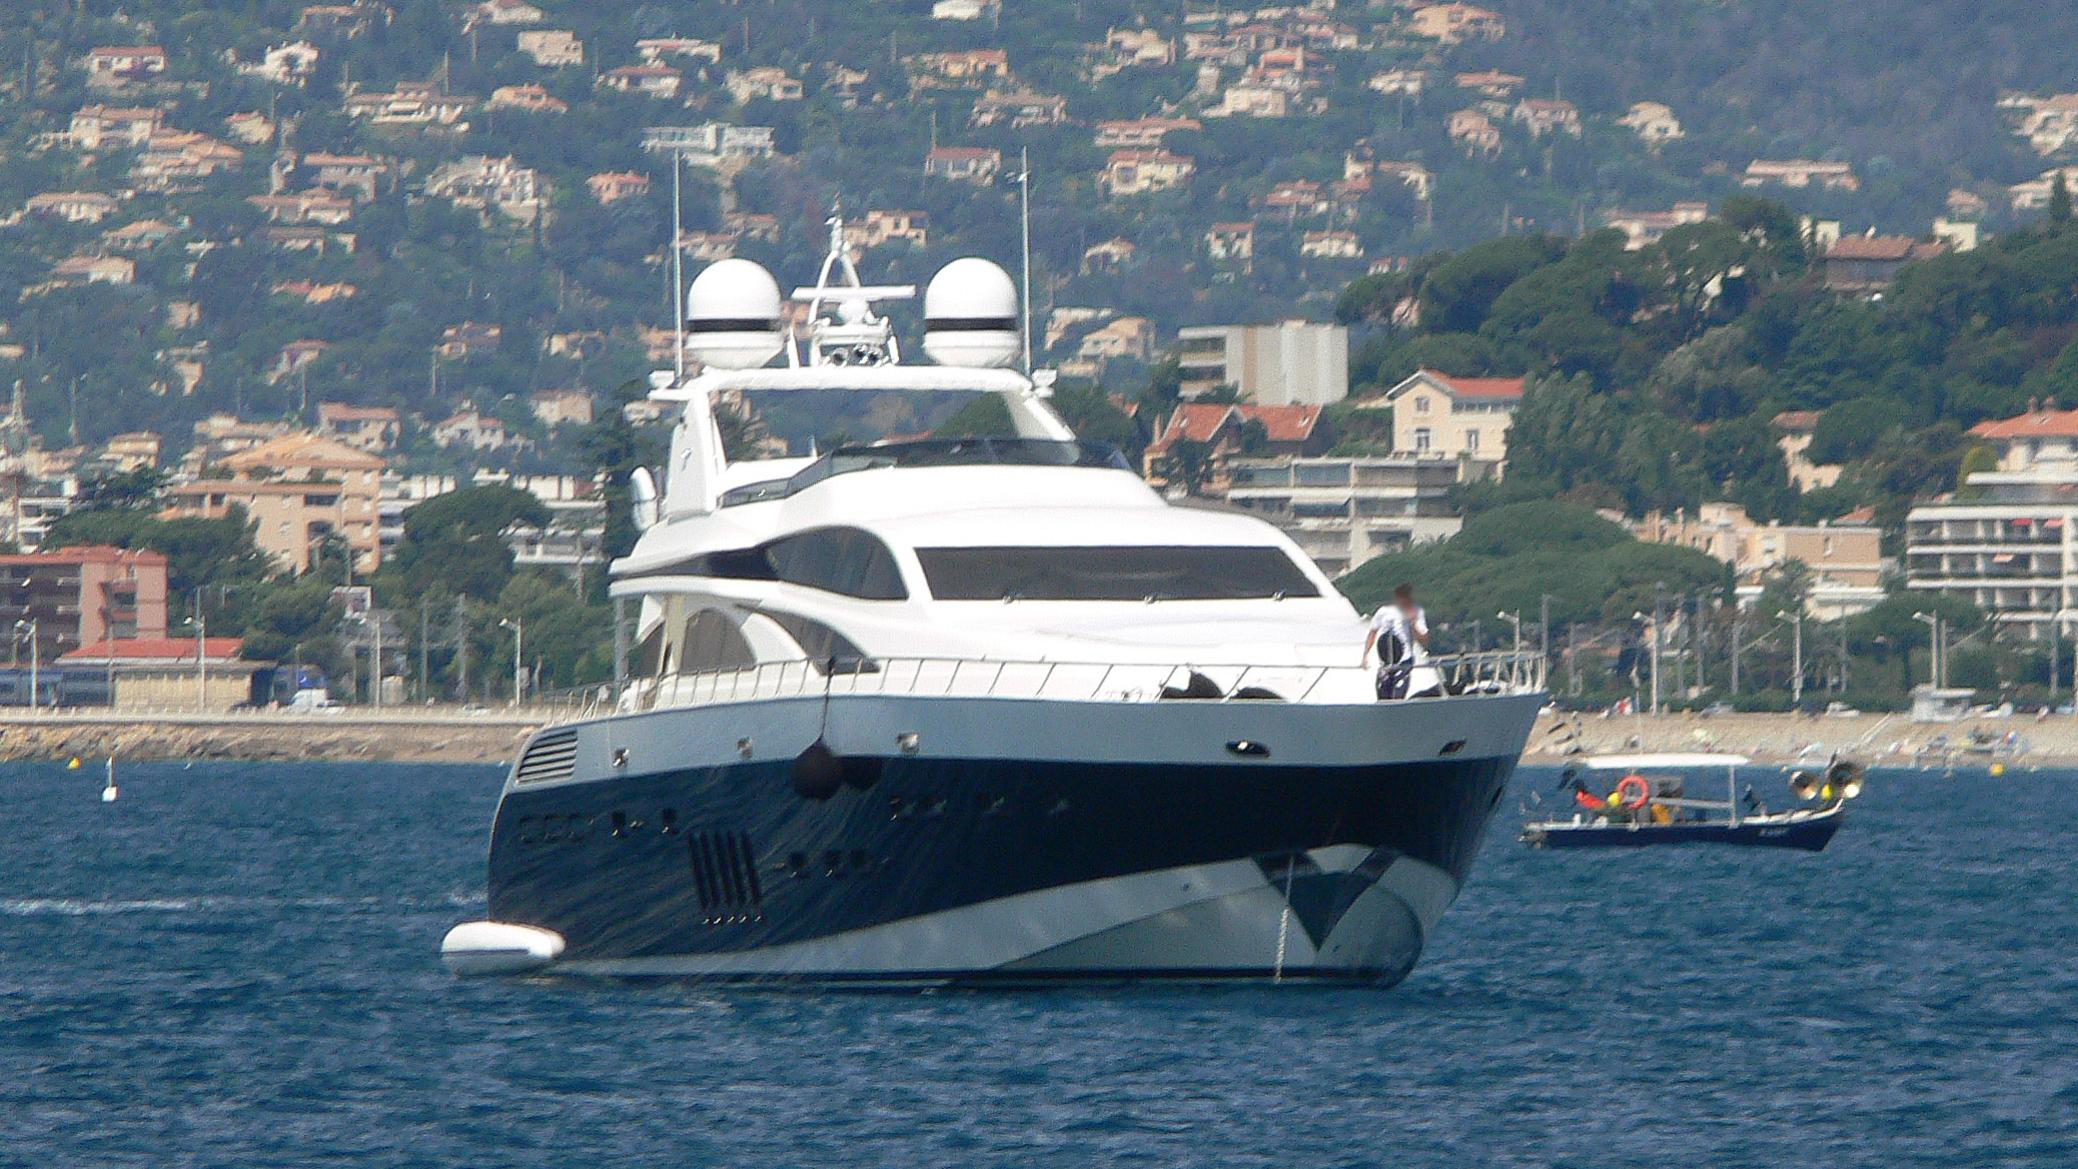 lis-motor-yacht-leopard-32-sport-2007-32m-bow